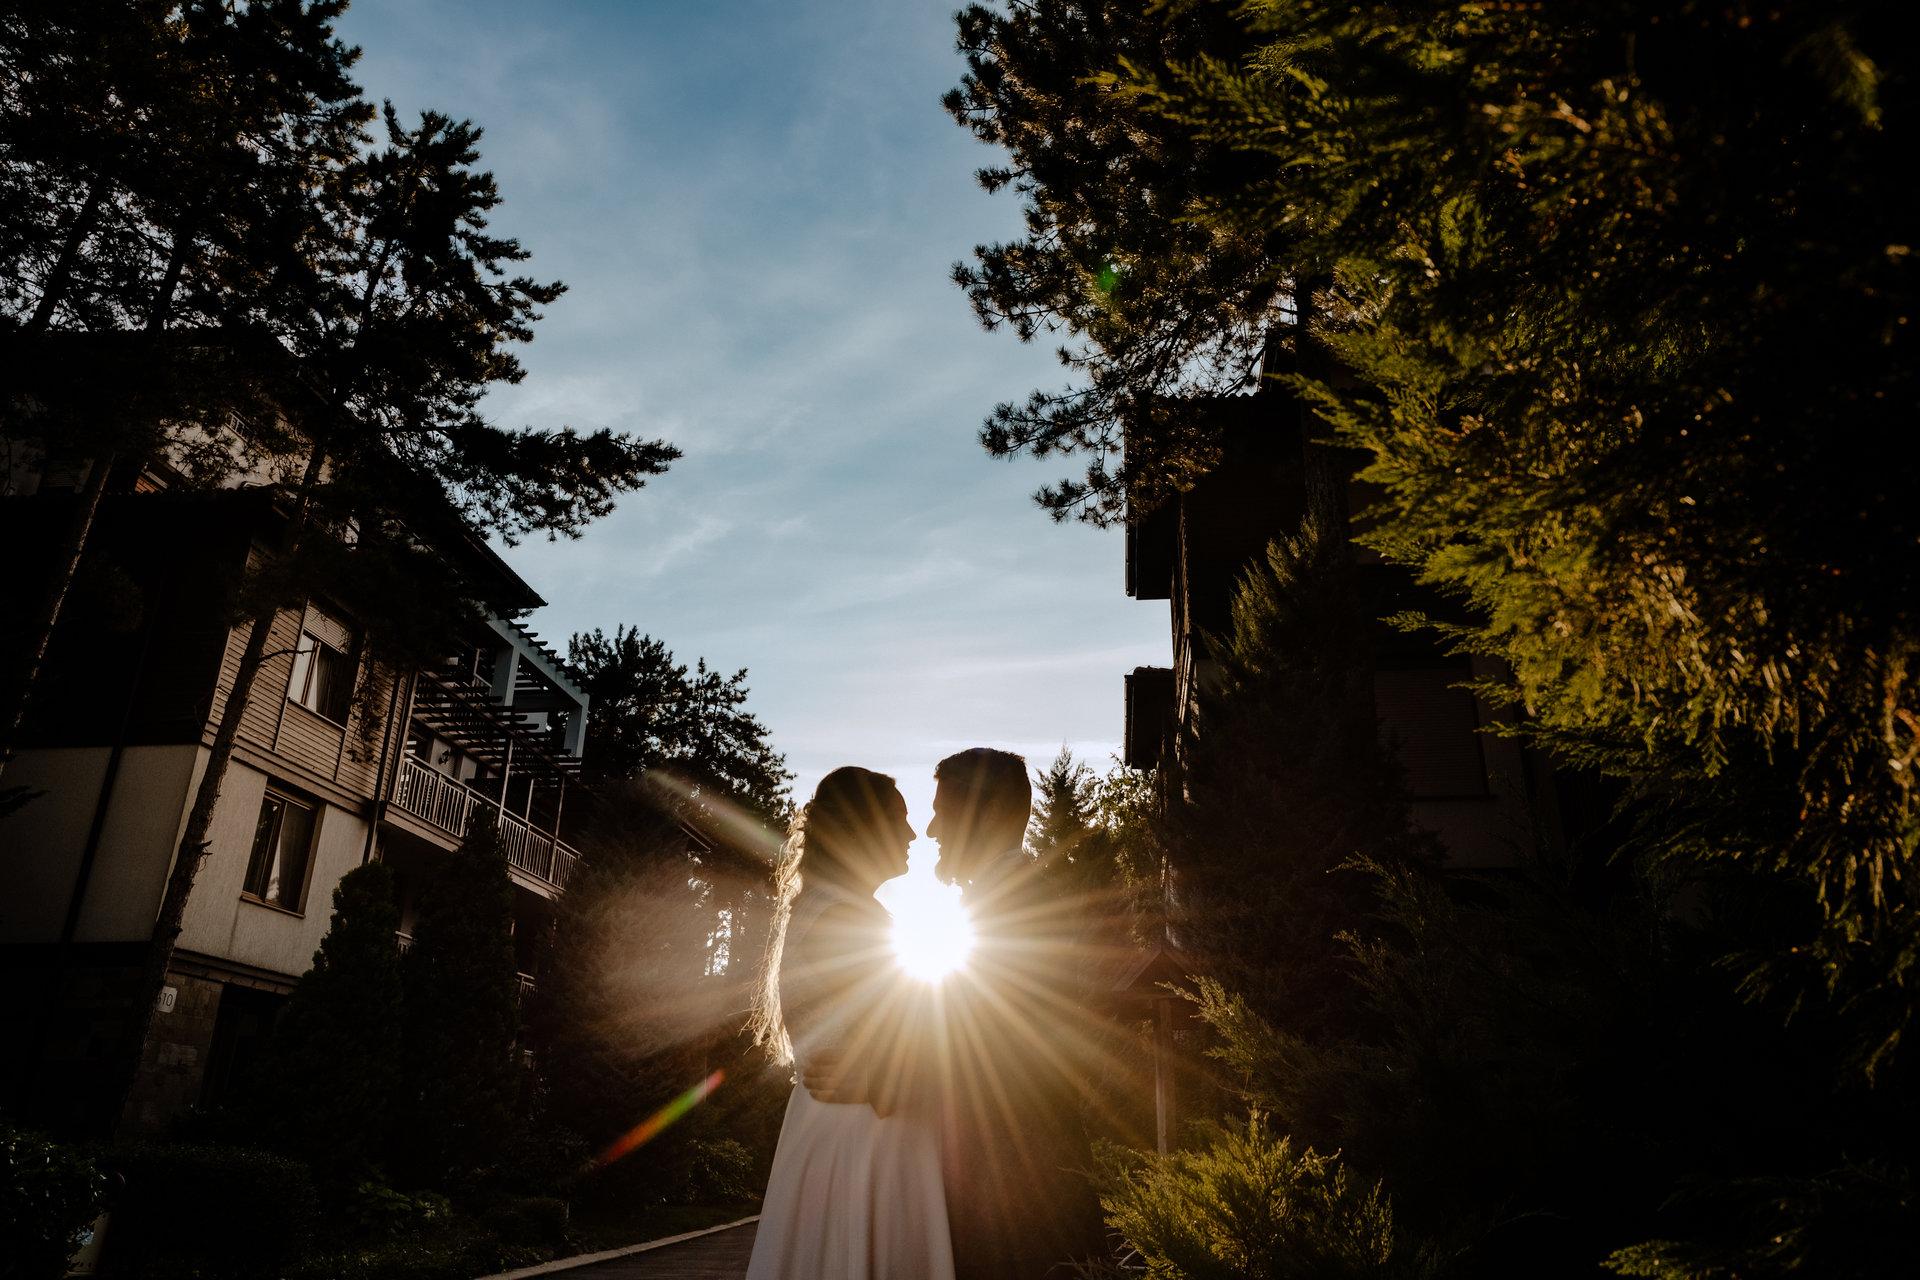 Love flare | Author Tsvetelina Deliyska - photokiller | PHOTO FORUM